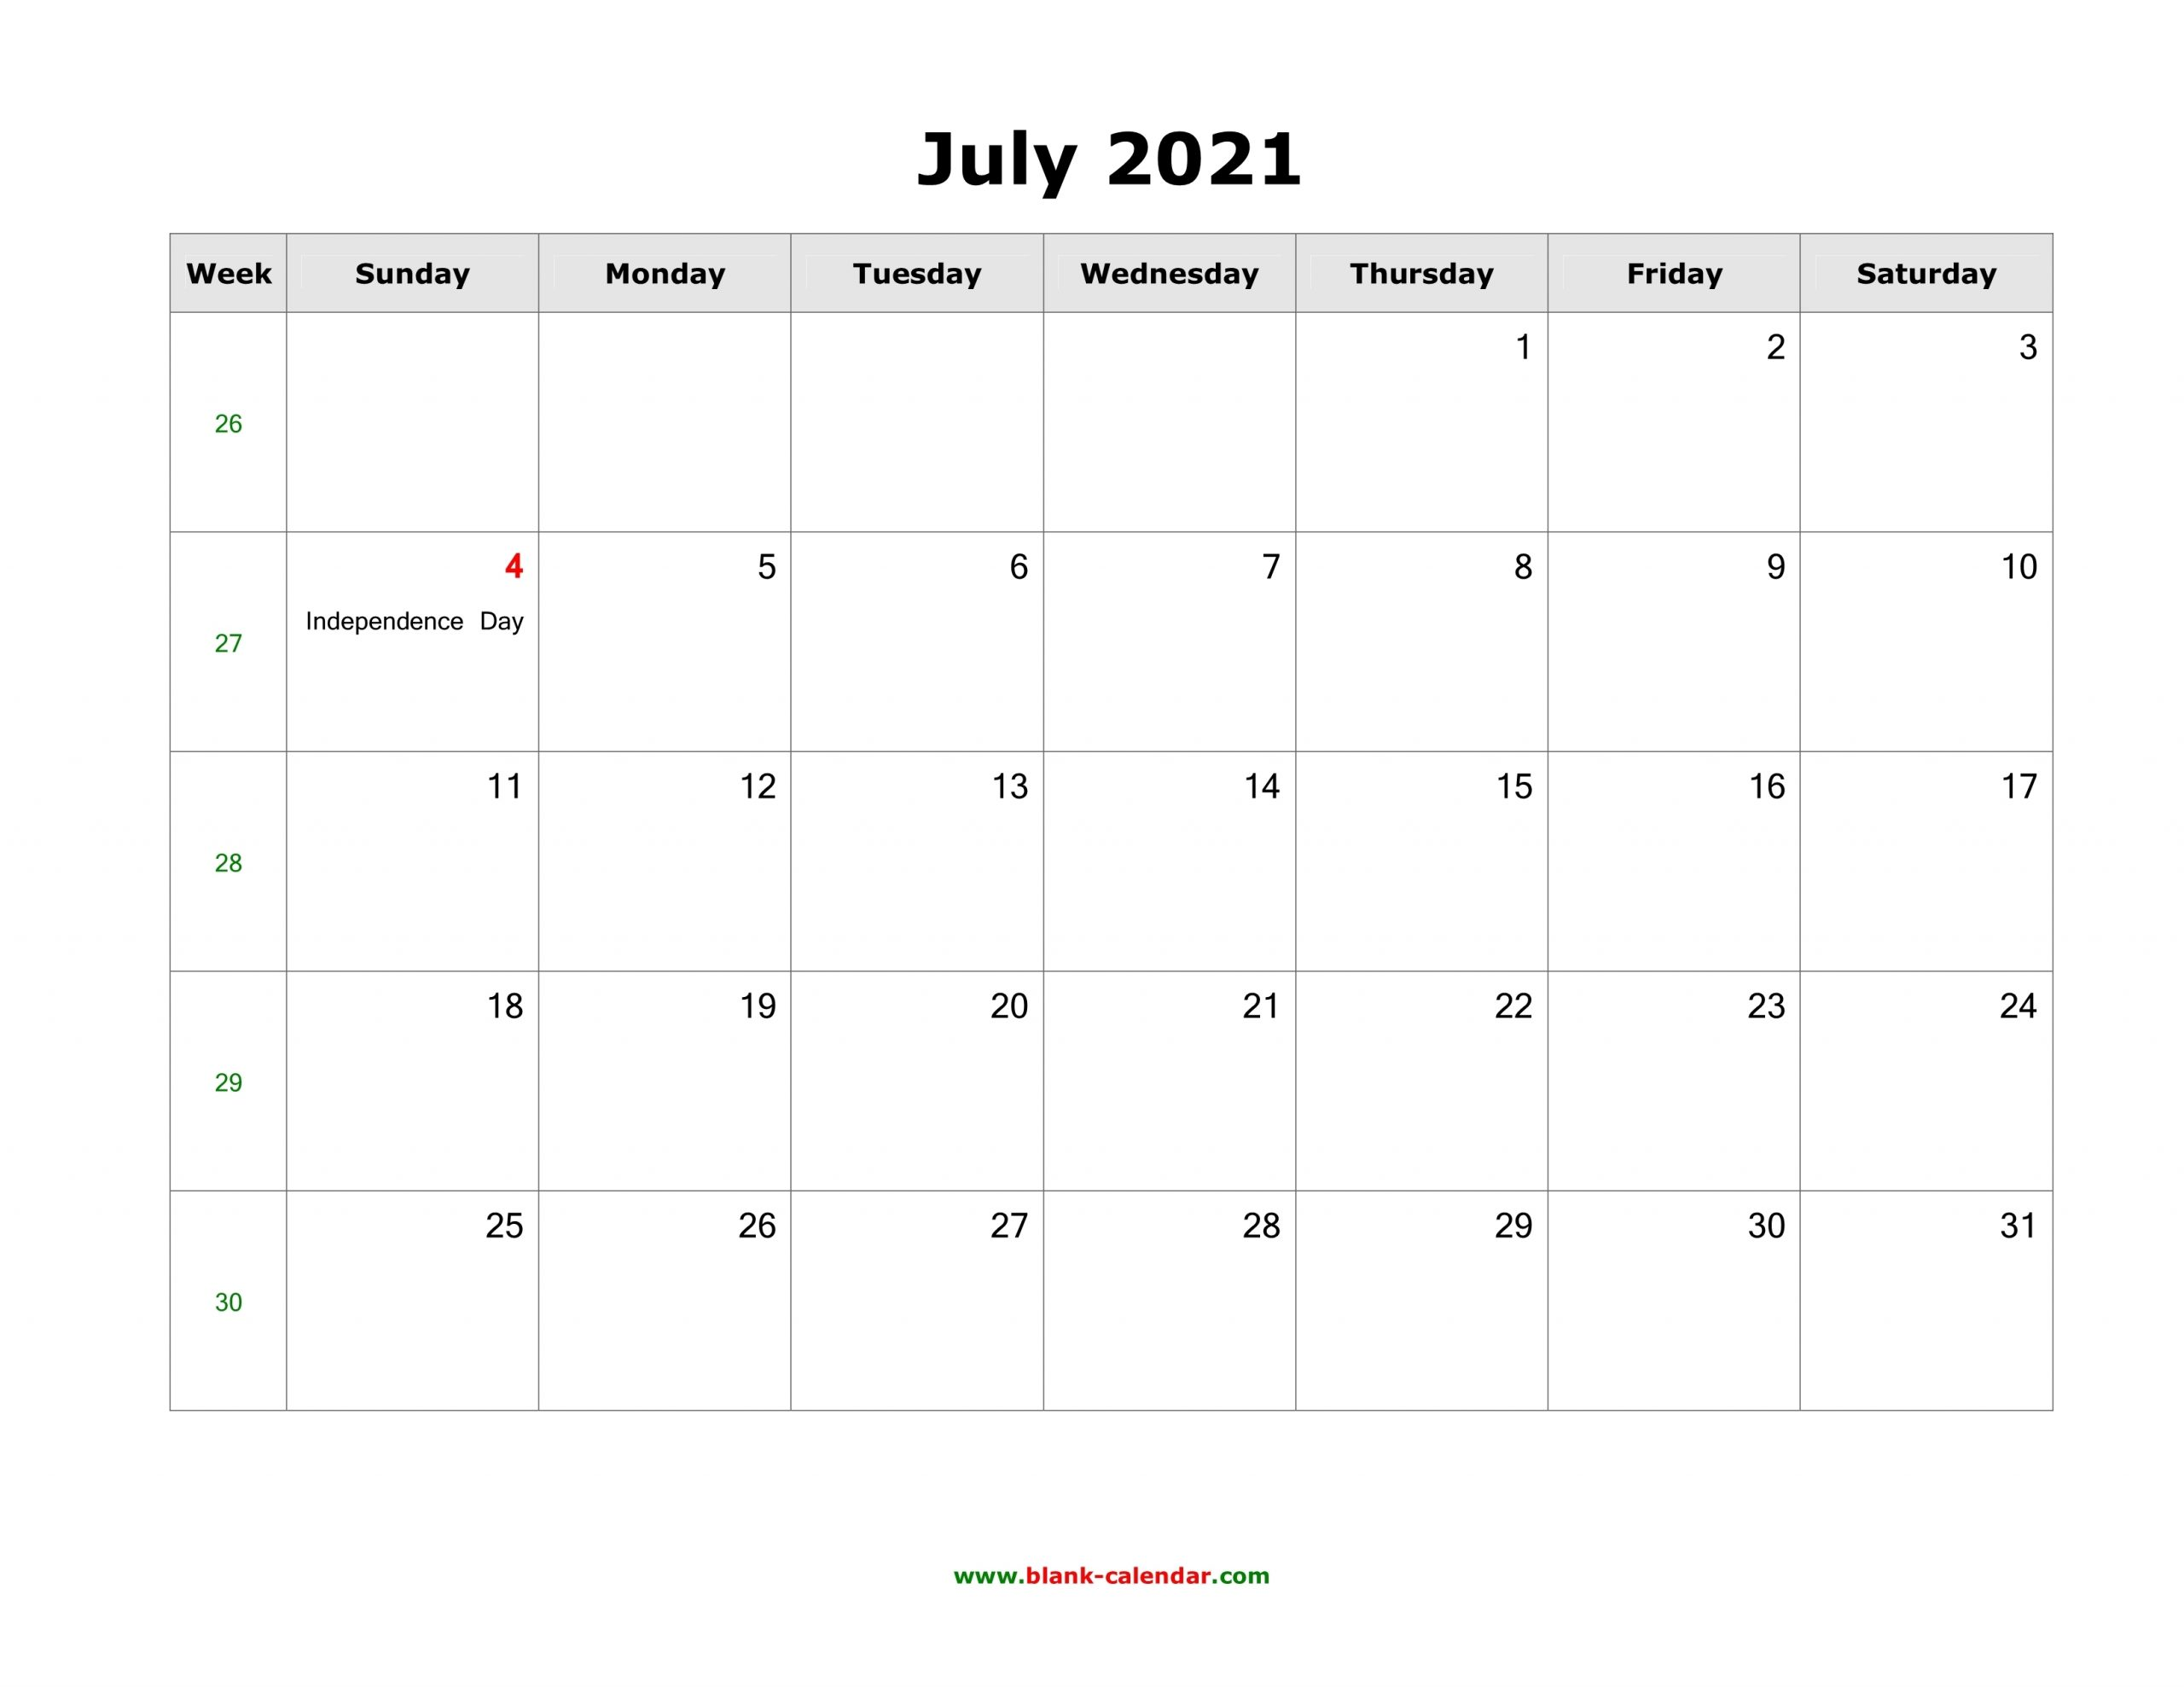 July 2021 Blank Calendar | Free Download Calendar Templates